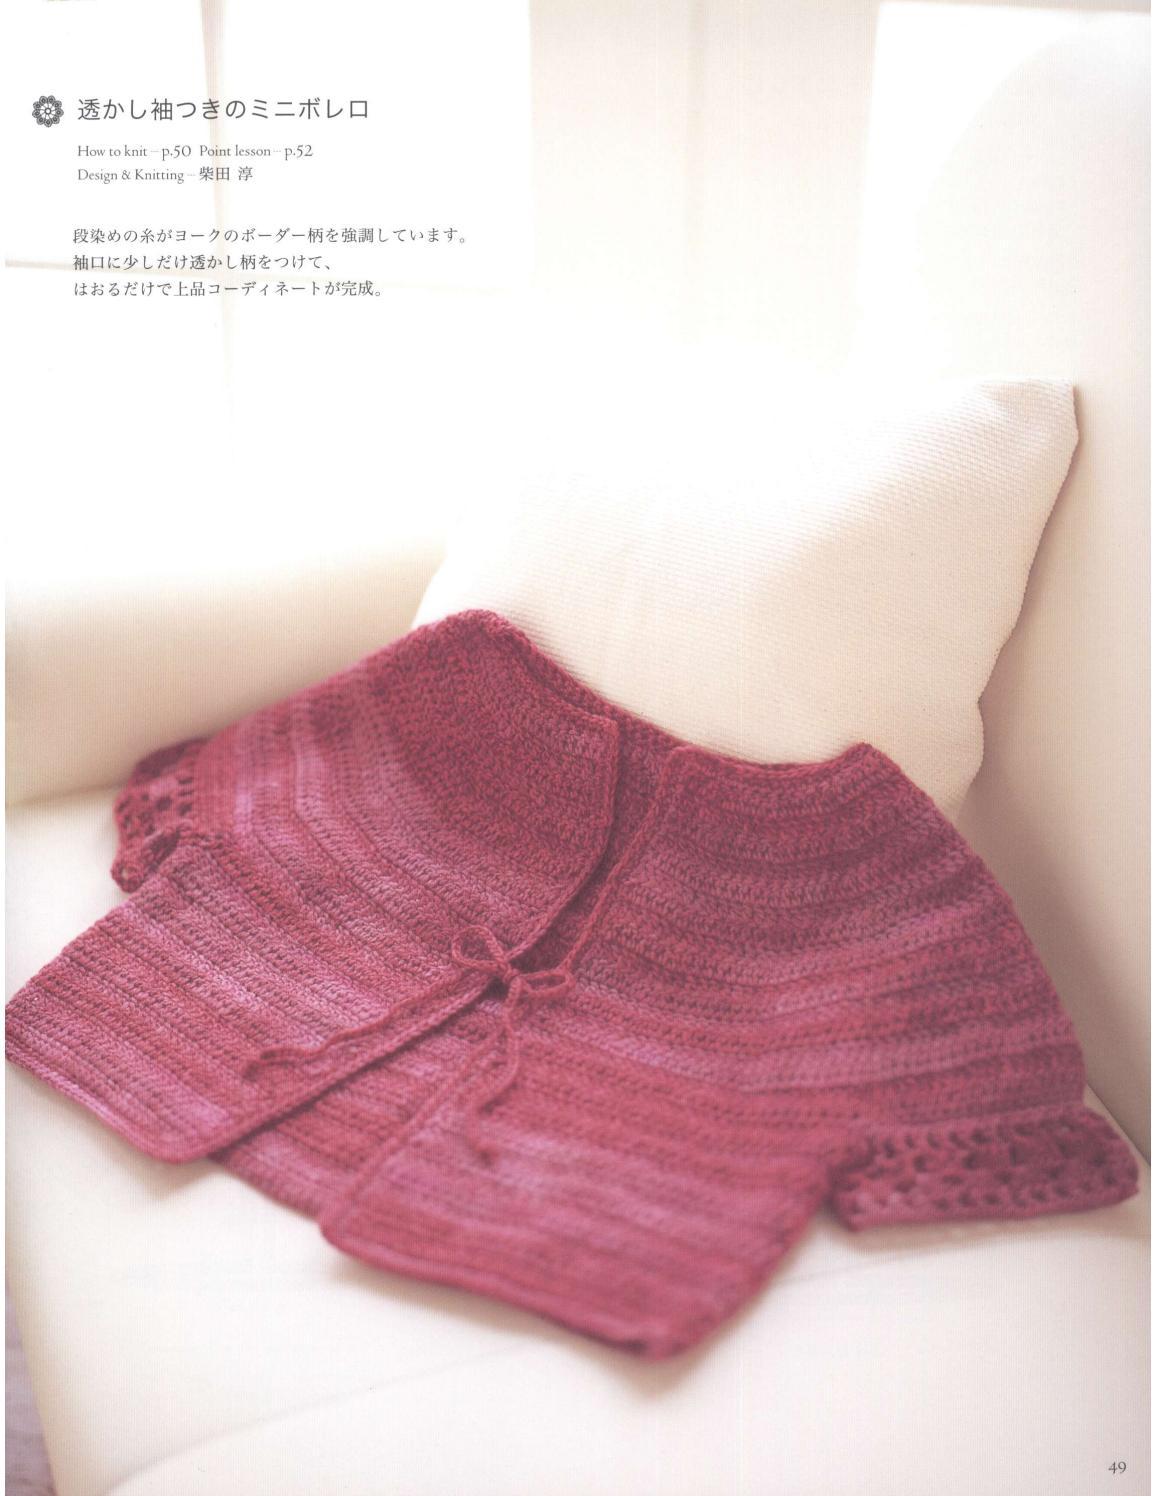 Asahi original crochet best selection 2012 page 49